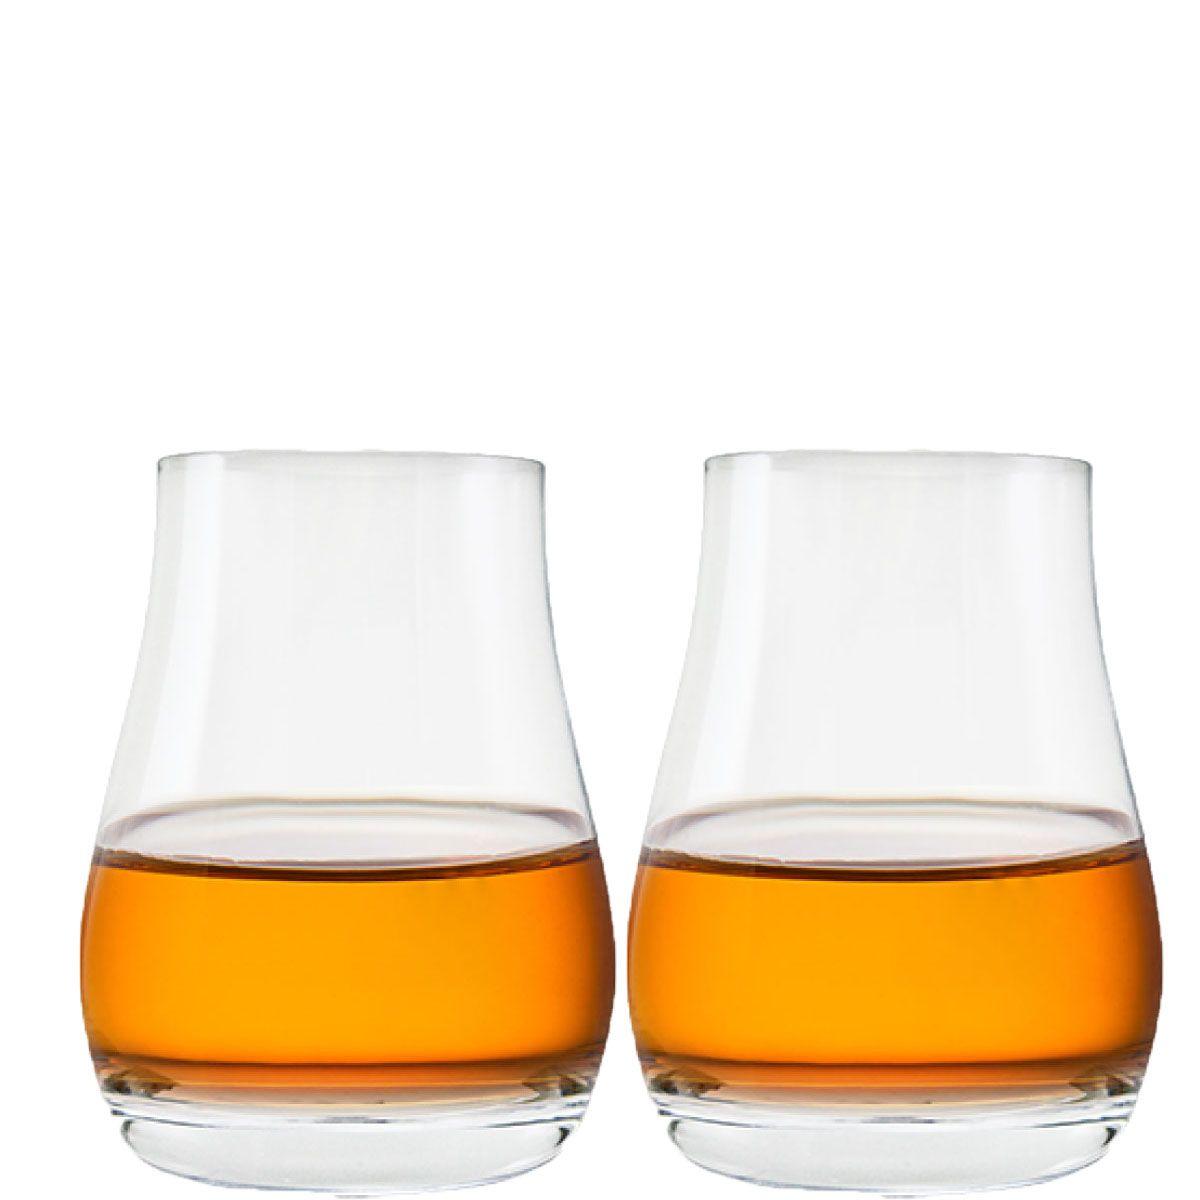 Copo Whisky Degustação 100ml 2 pcs